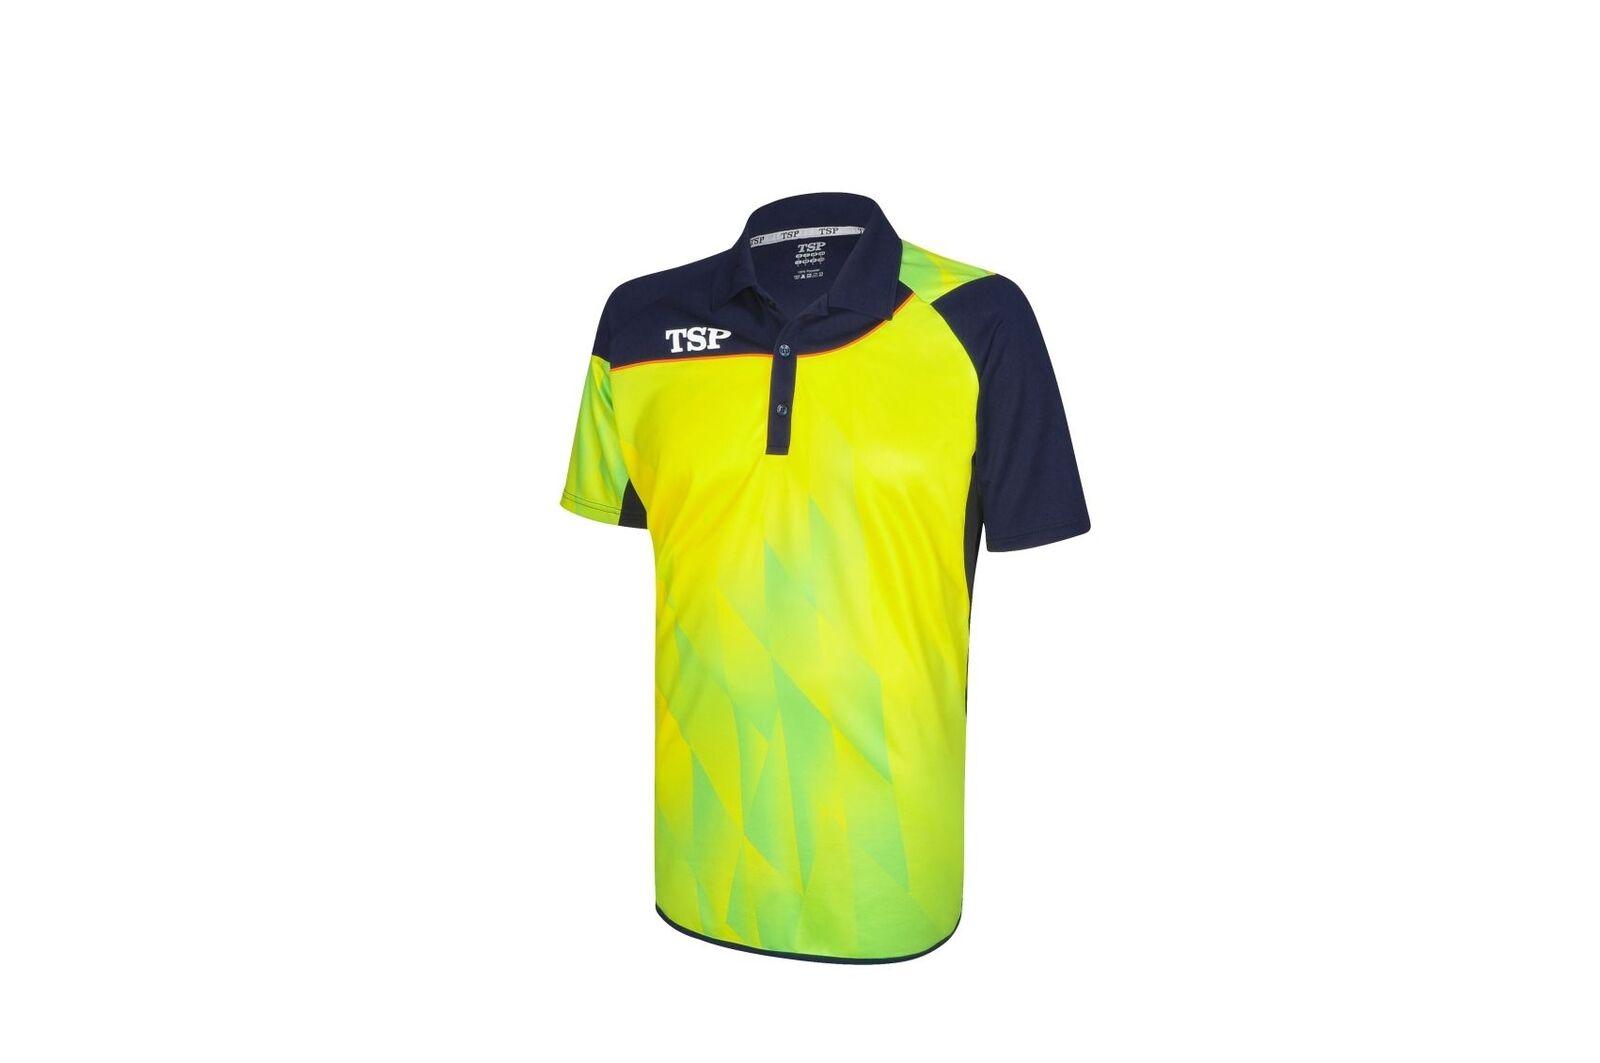 TSP Trikot HIKARI HIKARI HIKARI gelb  Tischtennisshirt Trikot Badminton Tischtennis Polo ad1d12